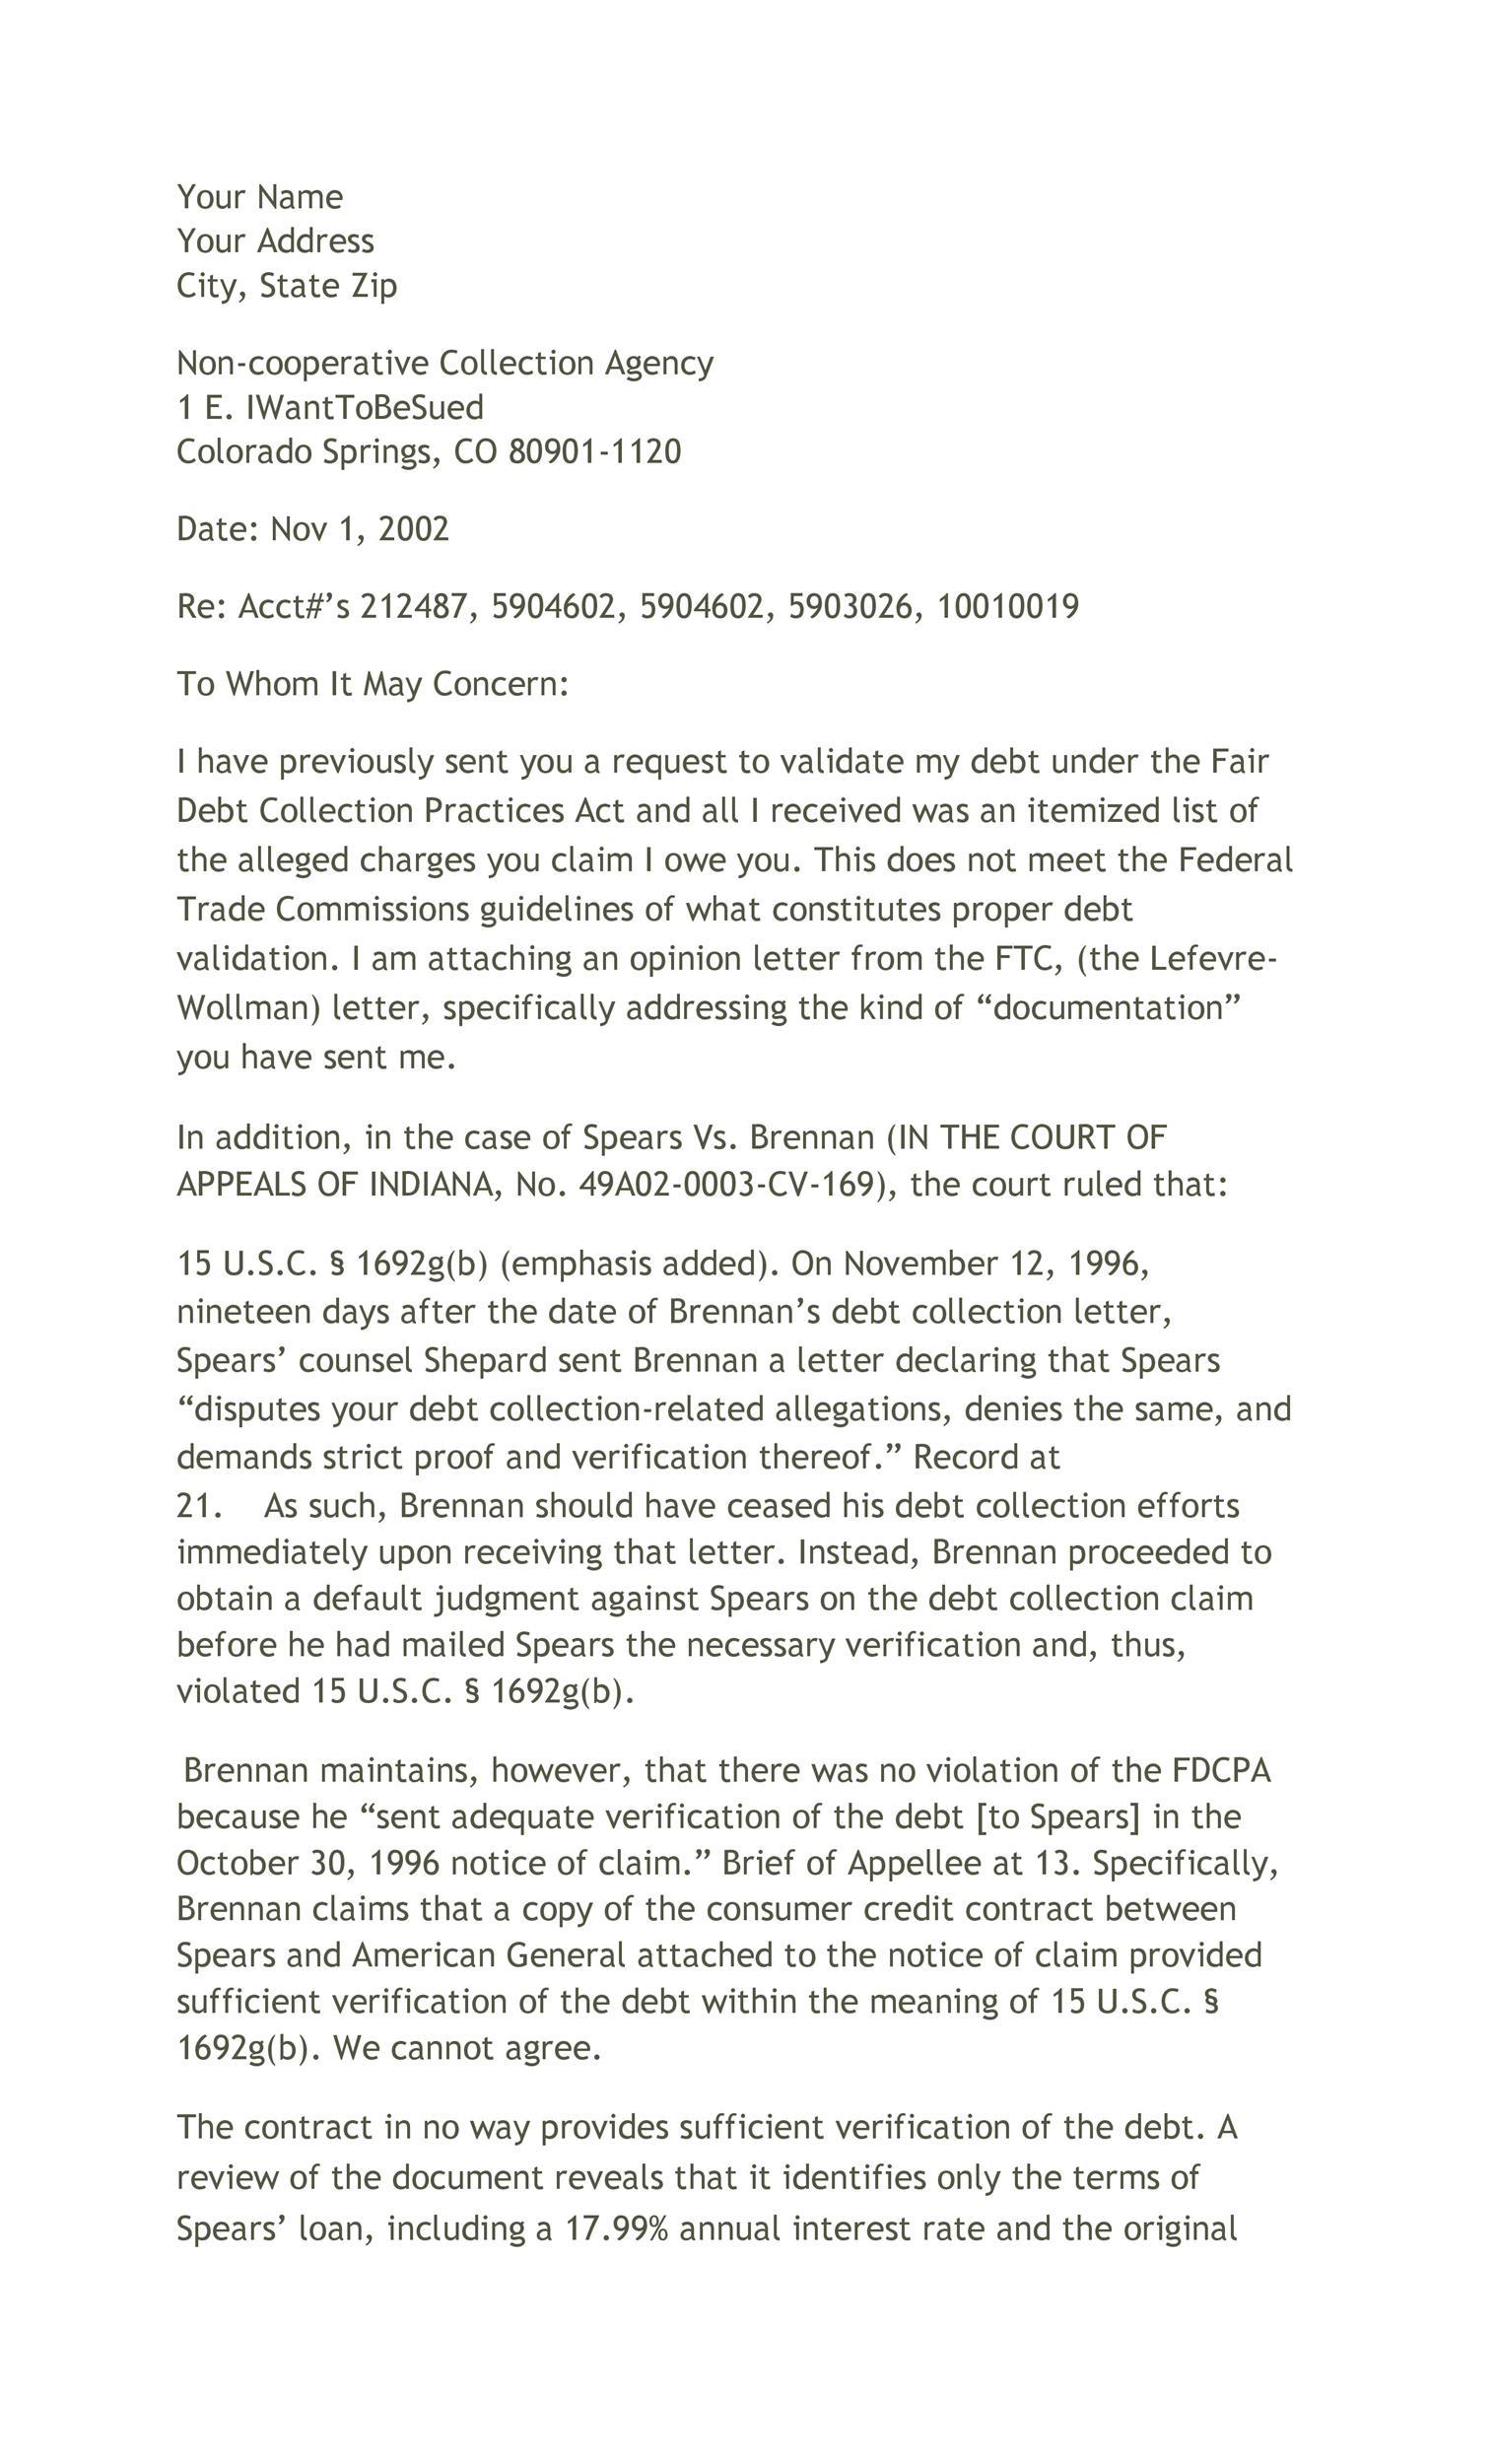 Free debt validation letter 32